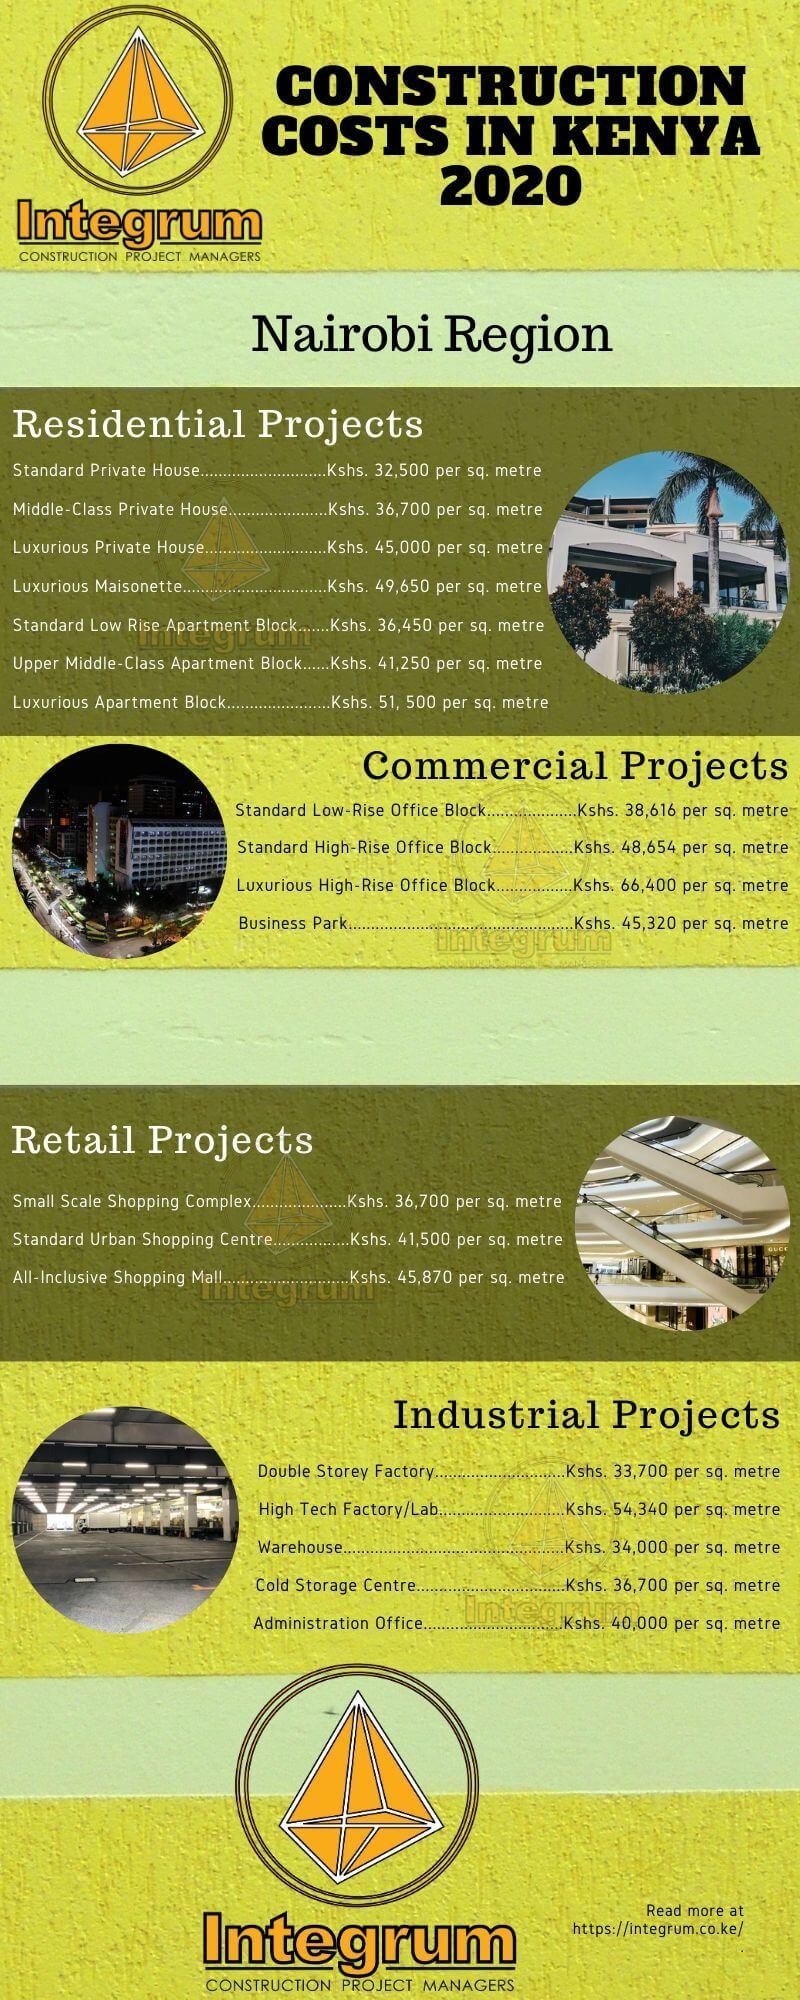 Nairobi construction costs in kenya